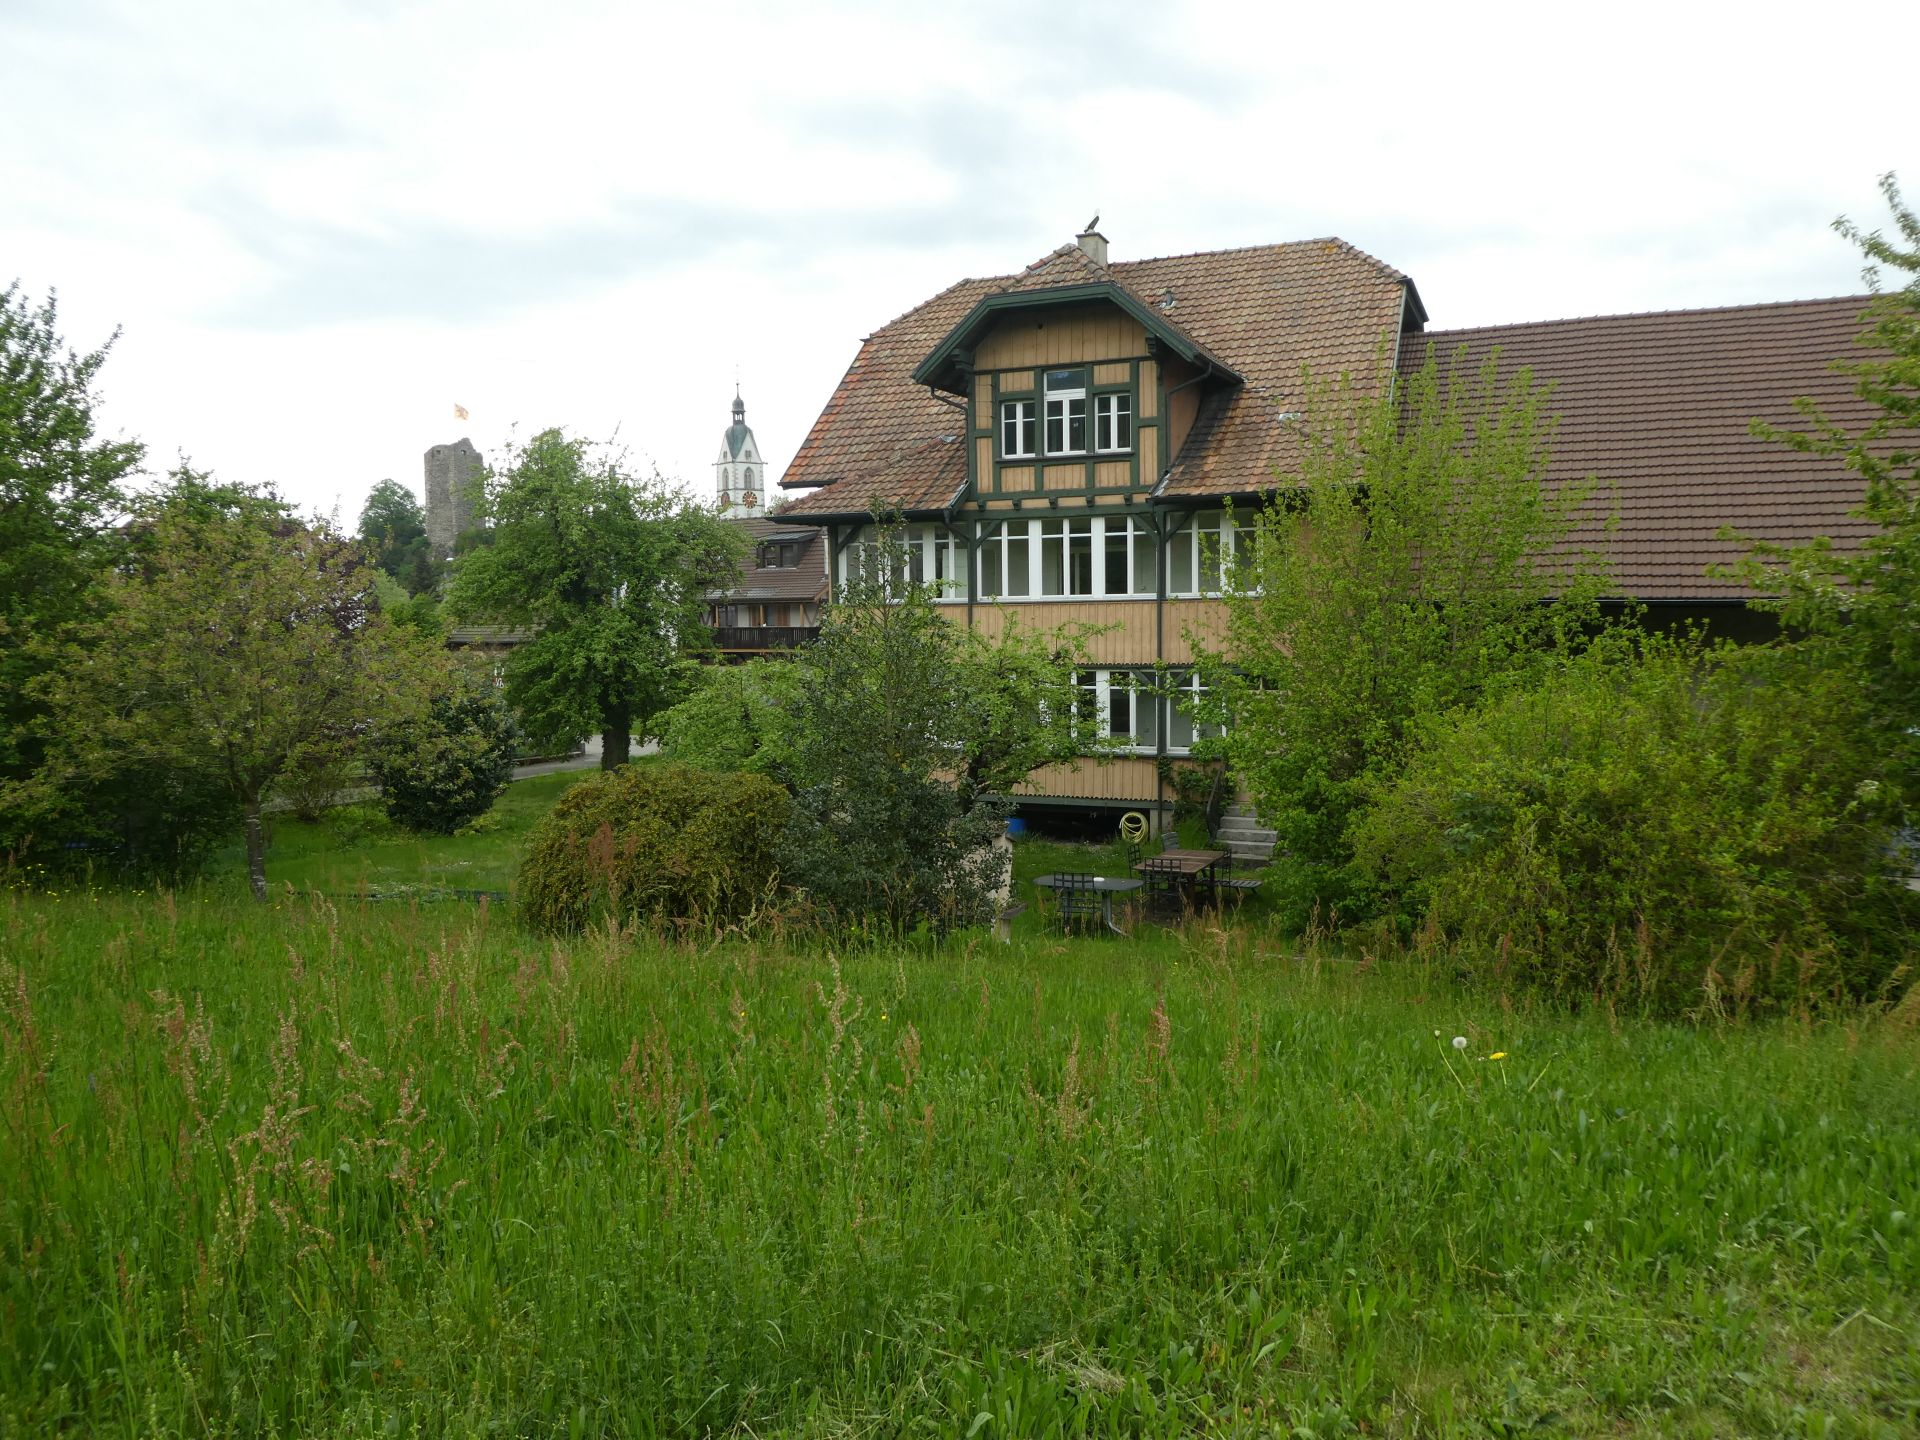 Mehrfamilienhaus zu vermieten per sofort